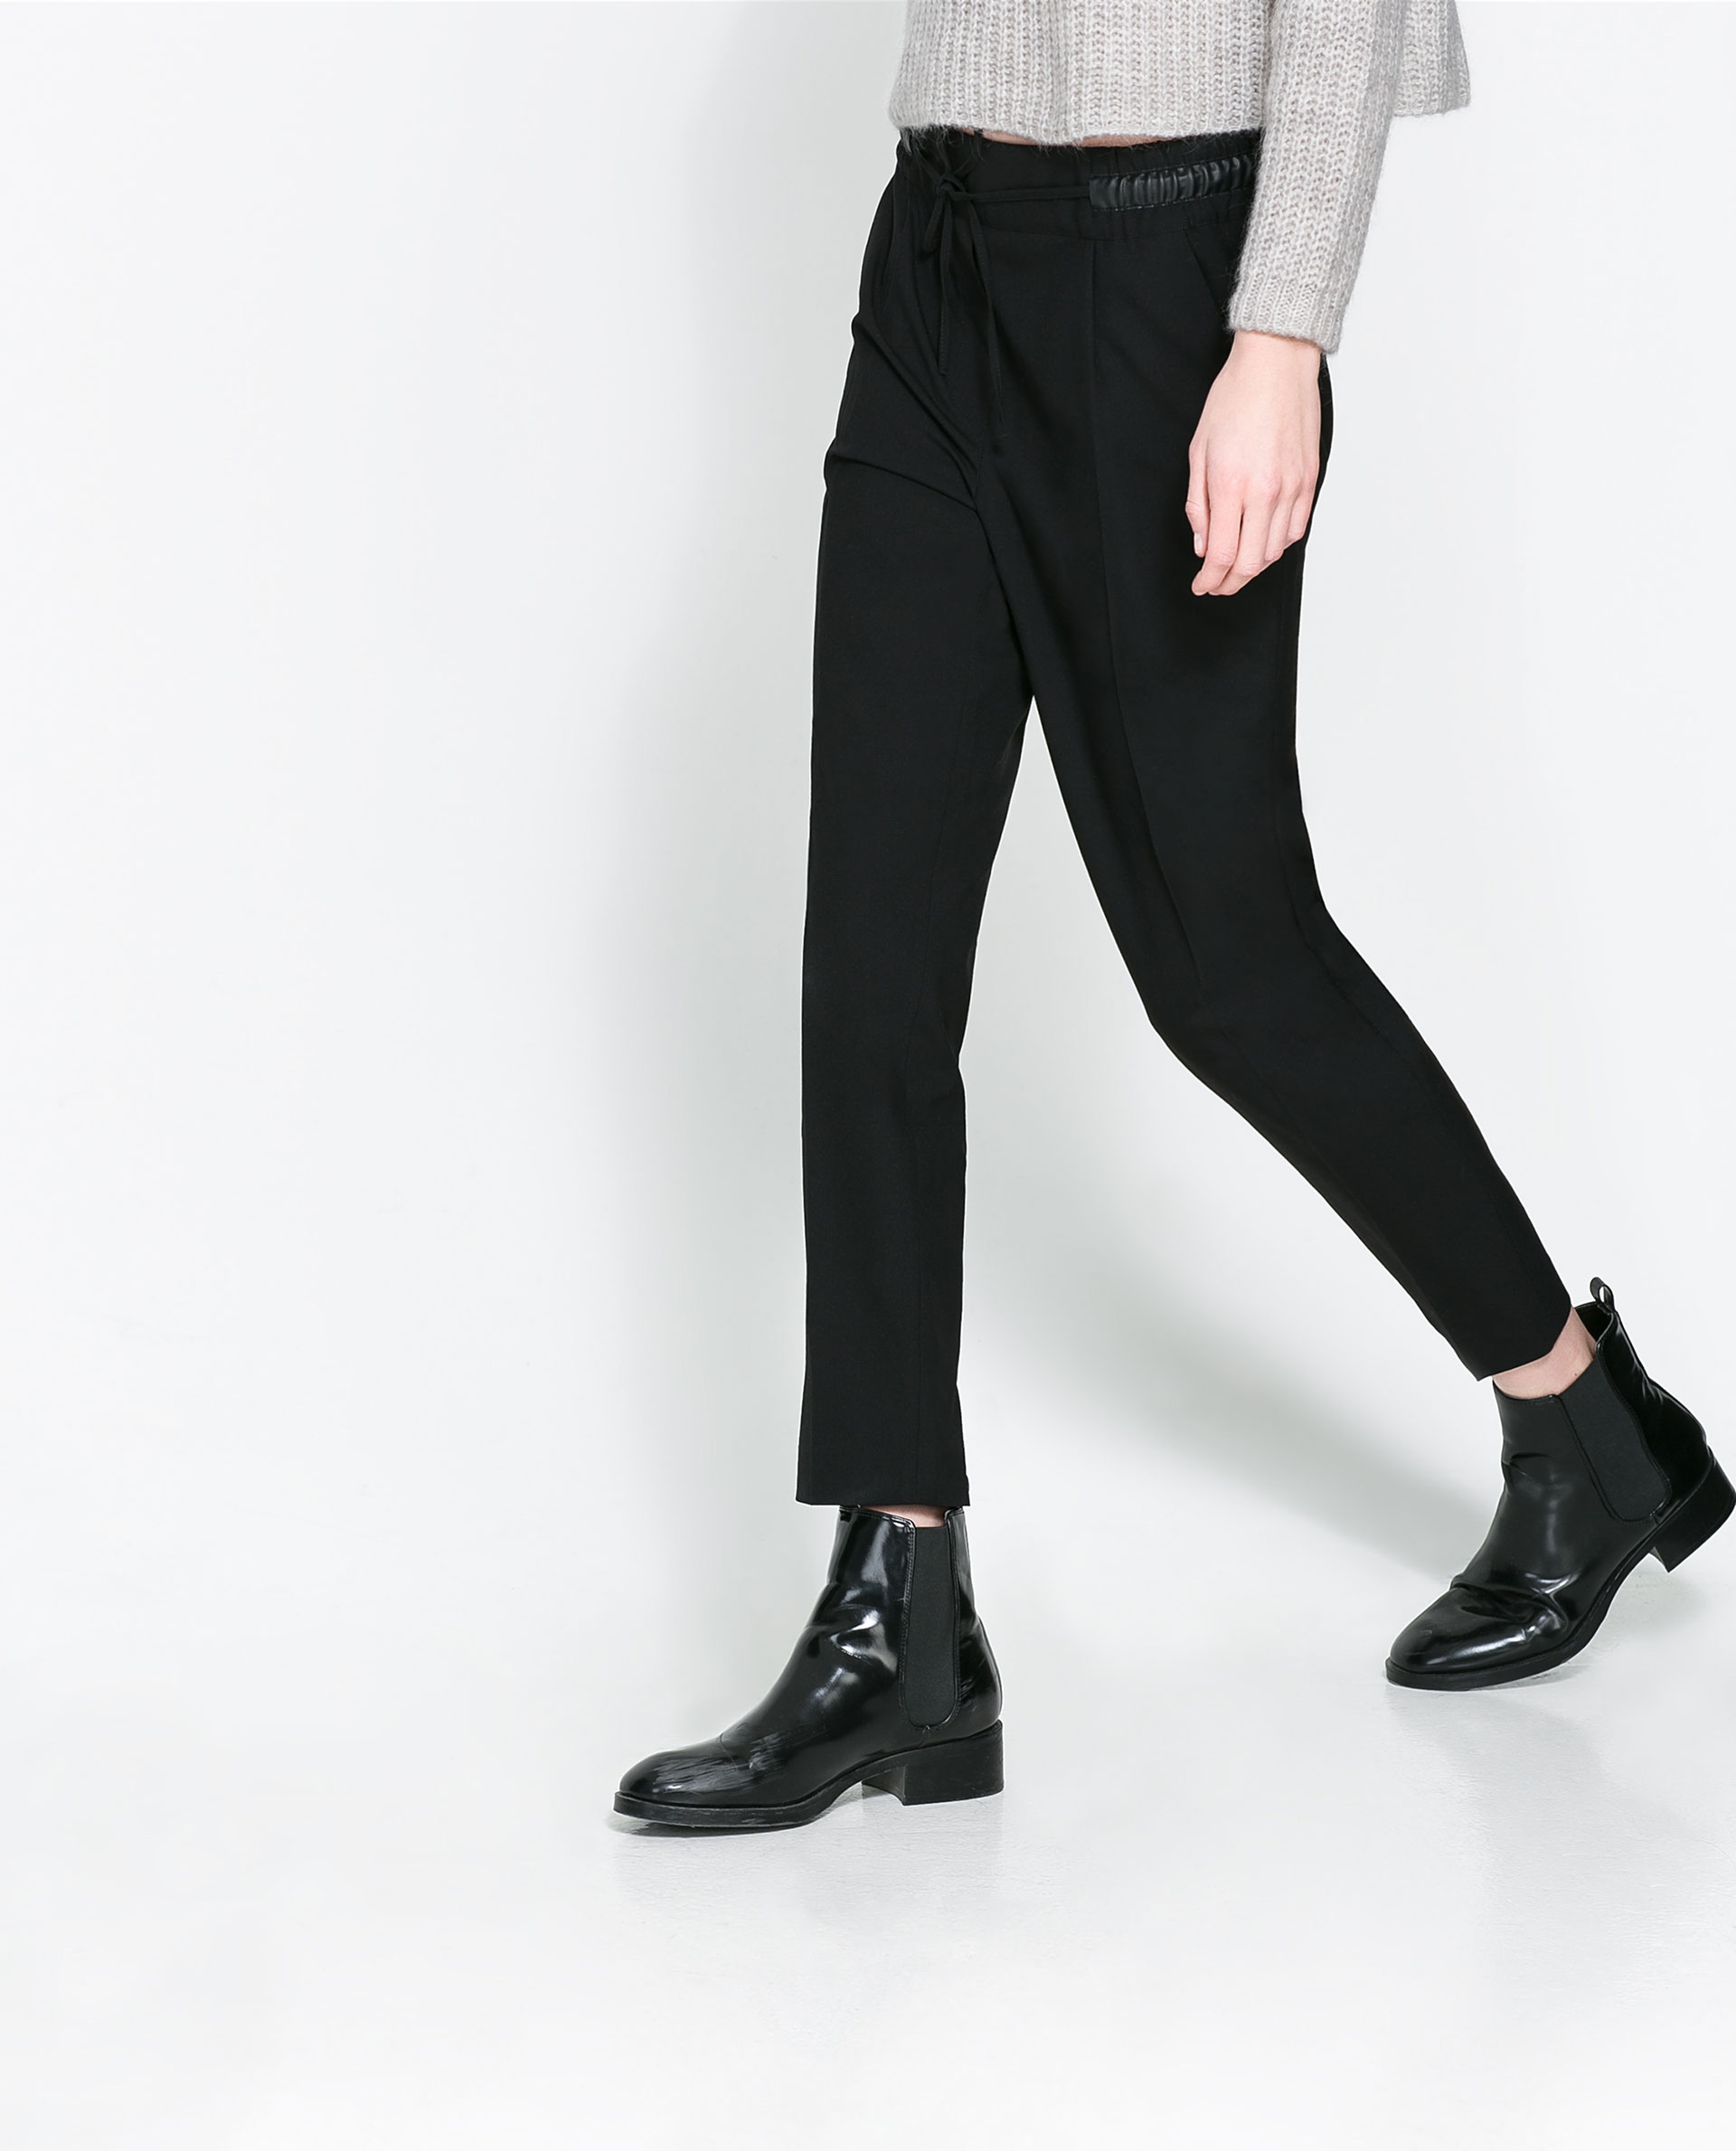 Wonderful Women39s Faux Leather Pants Women39s Black Leather Pants